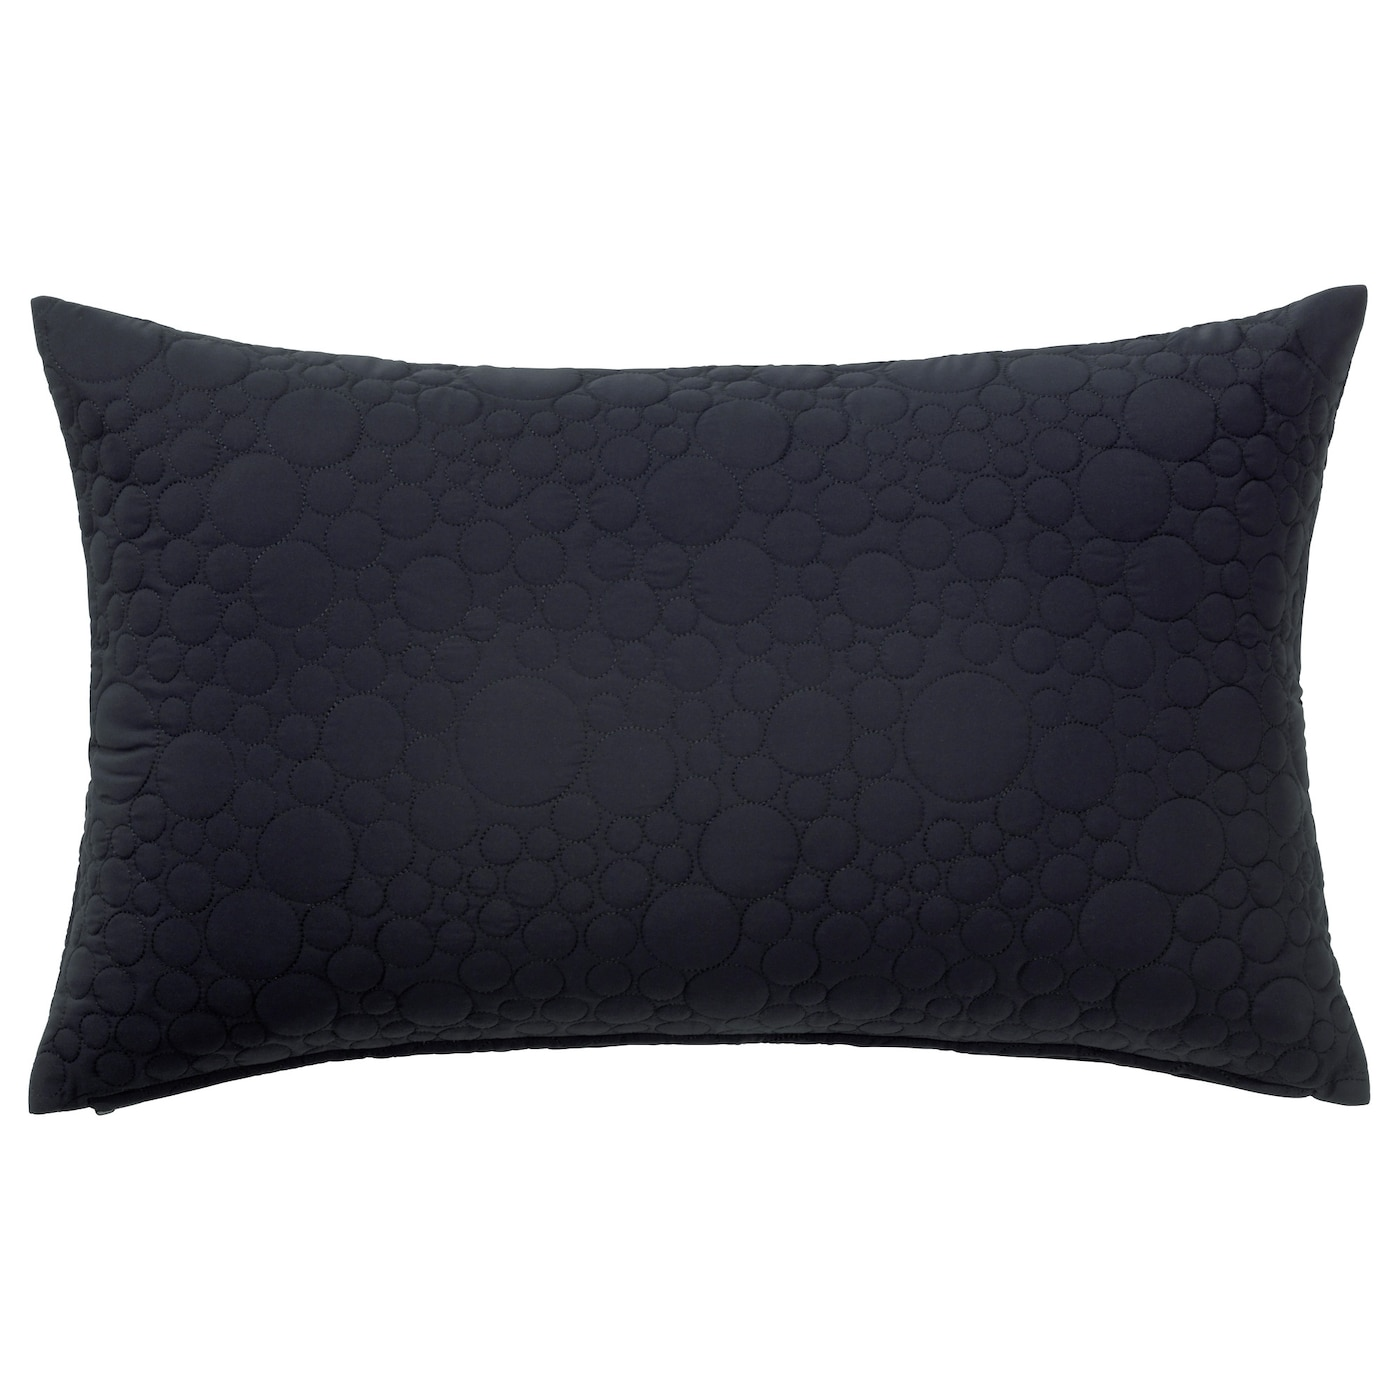 skogsek housse de coussin noir 40x65 cm ikea. Black Bedroom Furniture Sets. Home Design Ideas